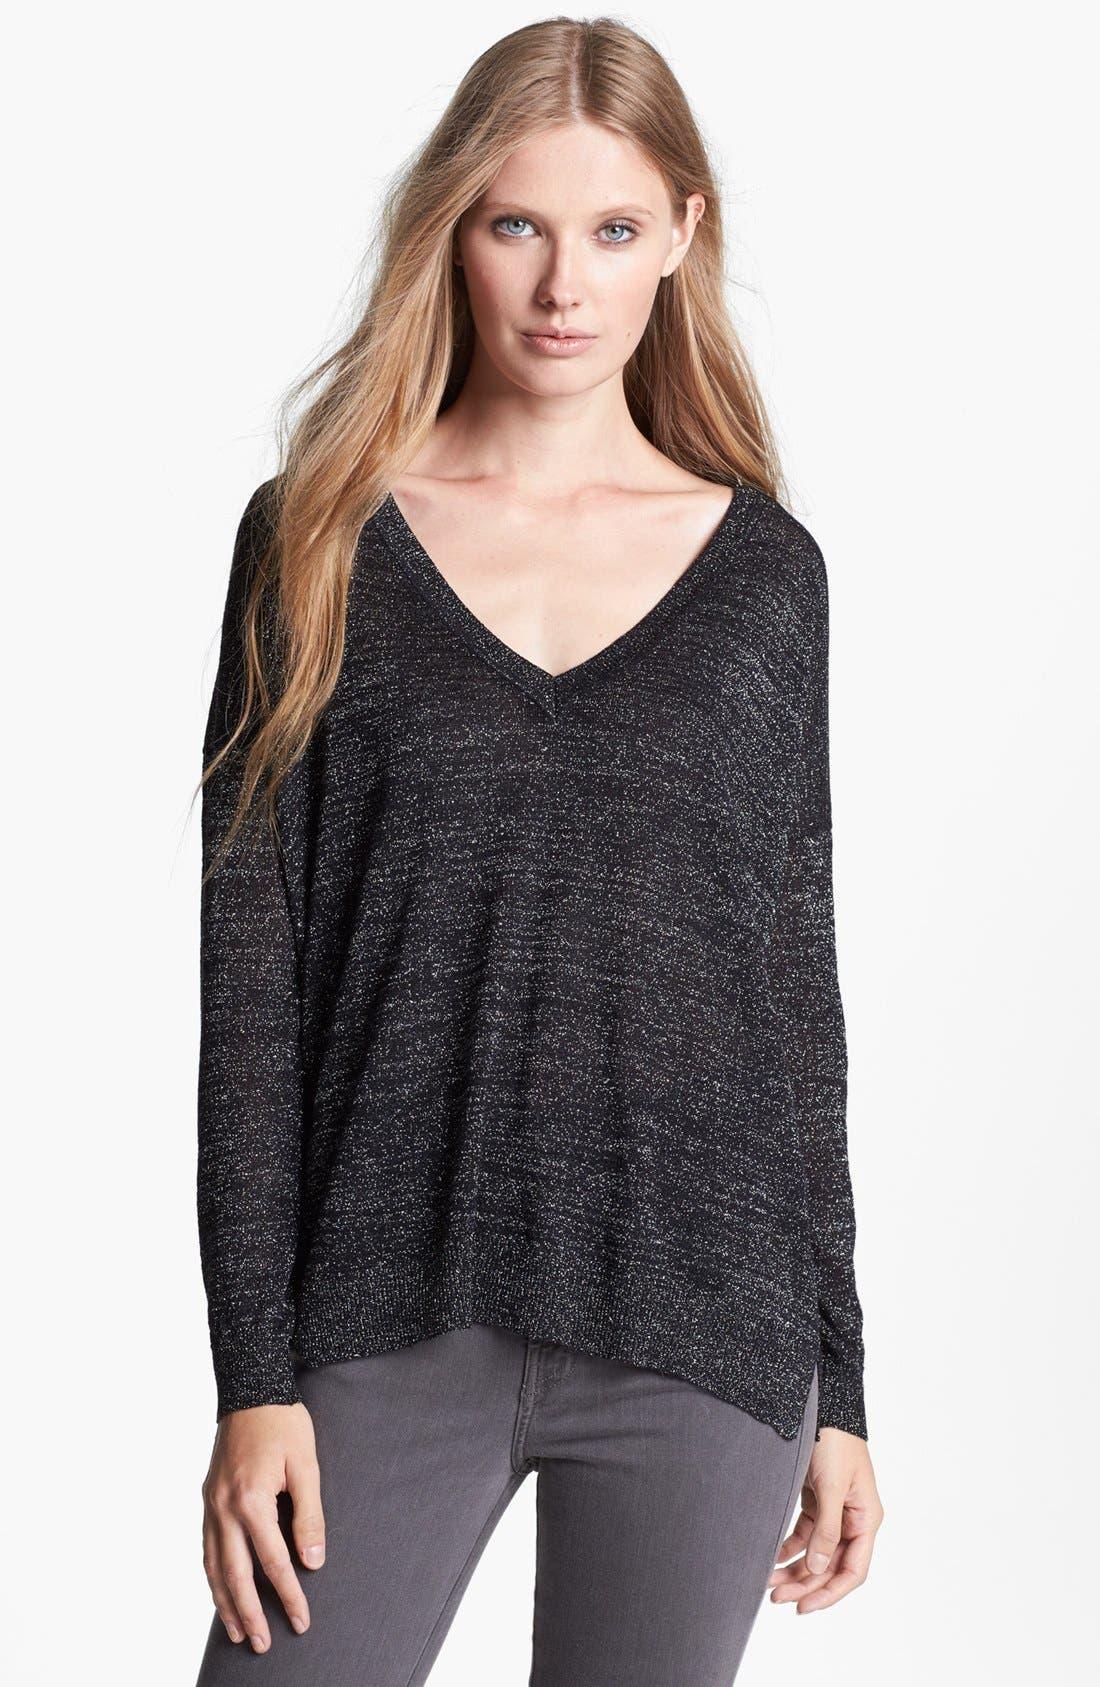 Alternate Image 1 Selected - Joie 'Calee' Metallic Sweater